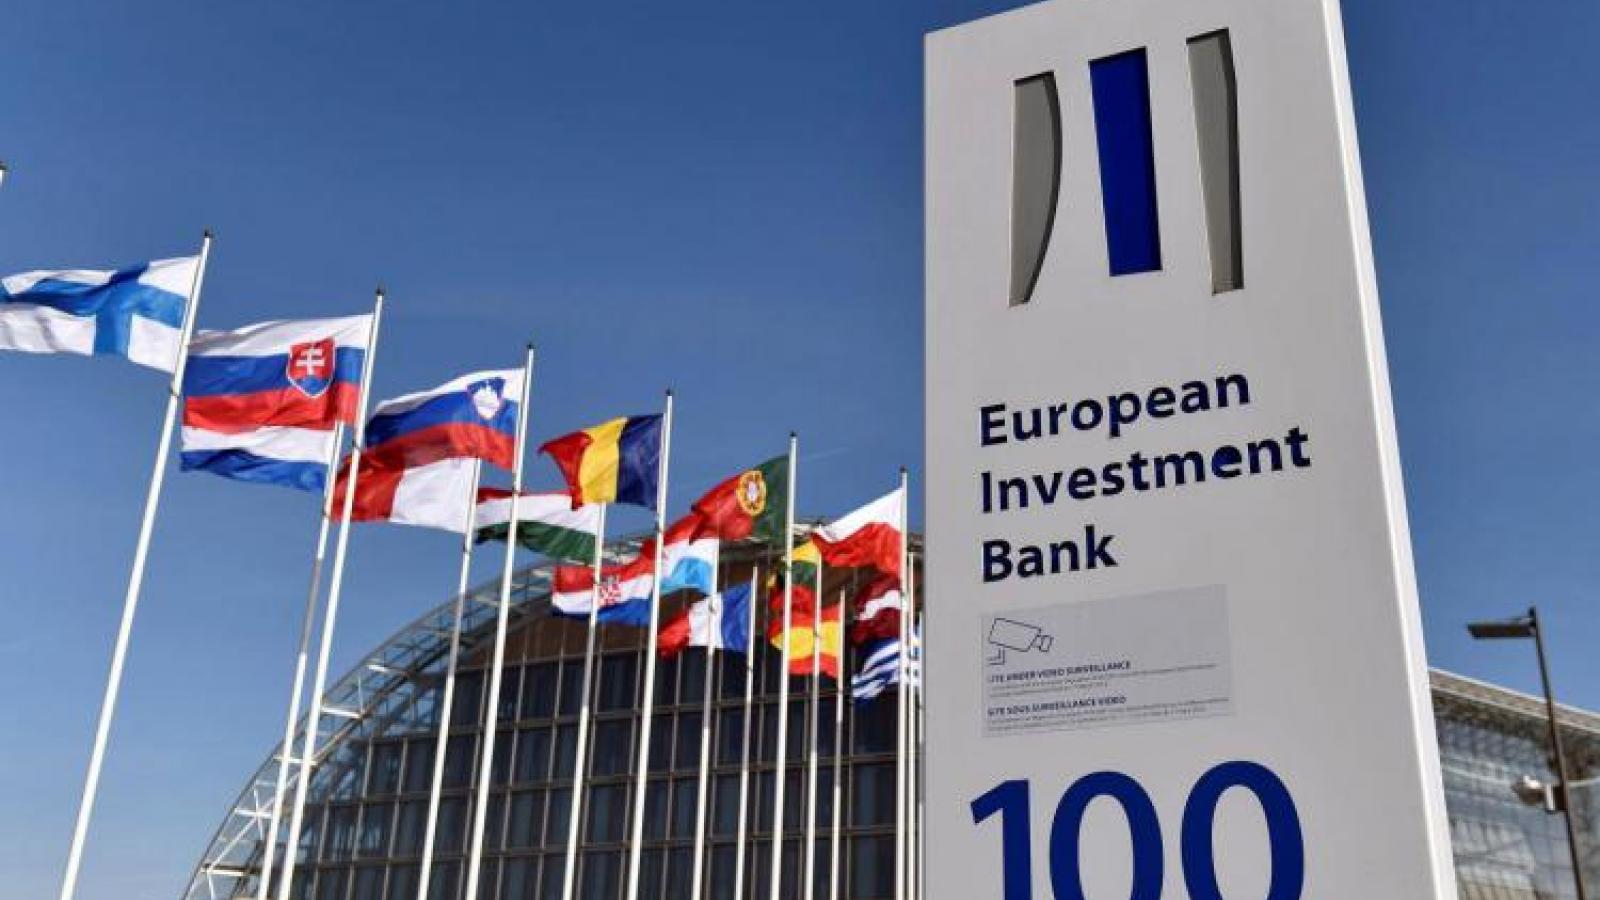 Jordan signs 260 mln euros loan with European Investment Bank